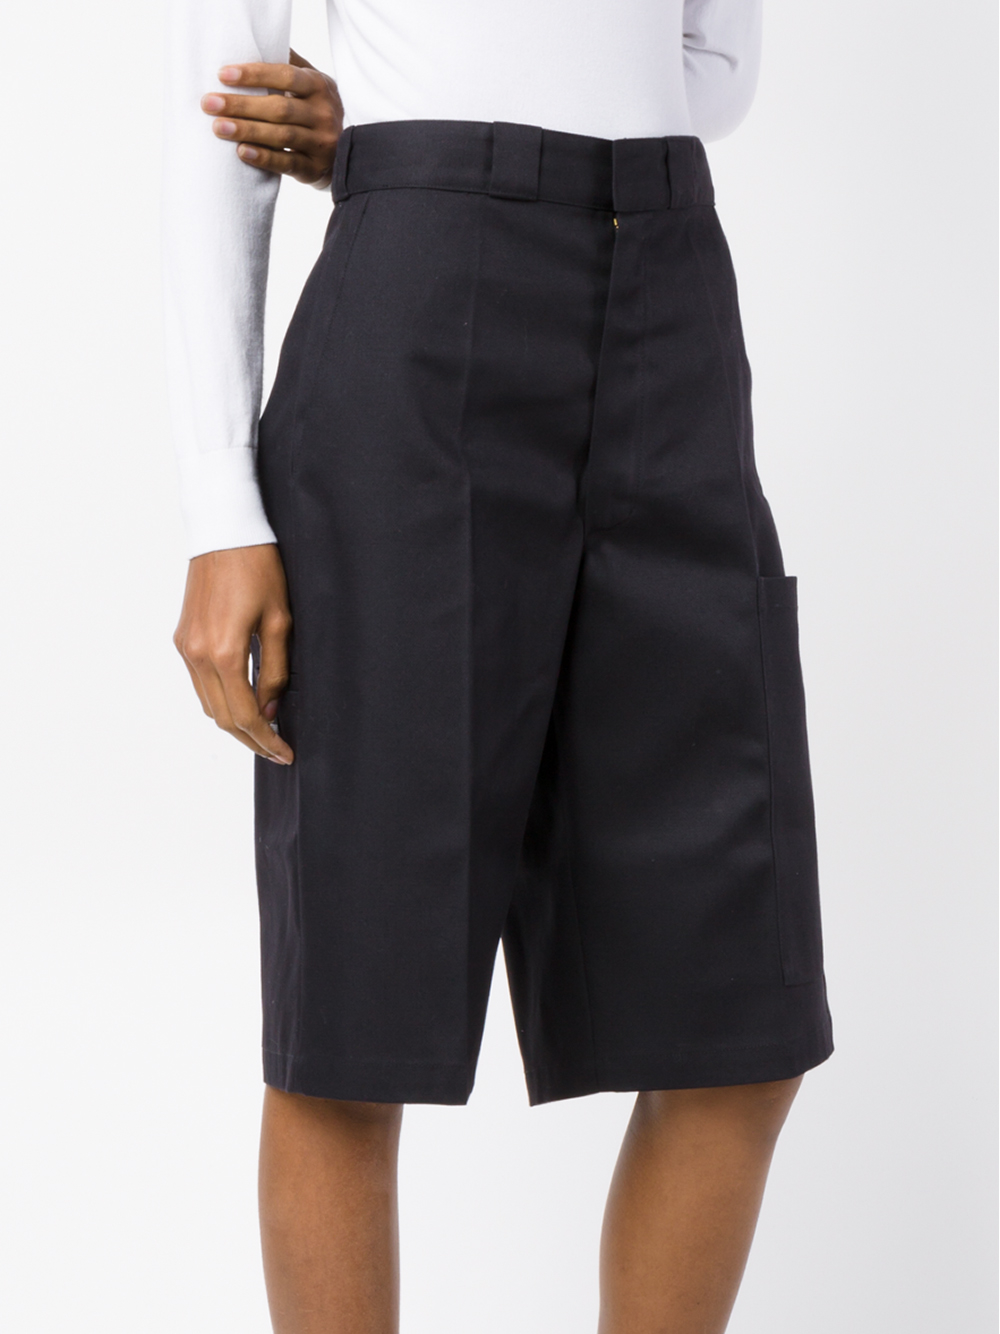 af2dd284e Vetements Knee-length Shorts in Black - Lyst